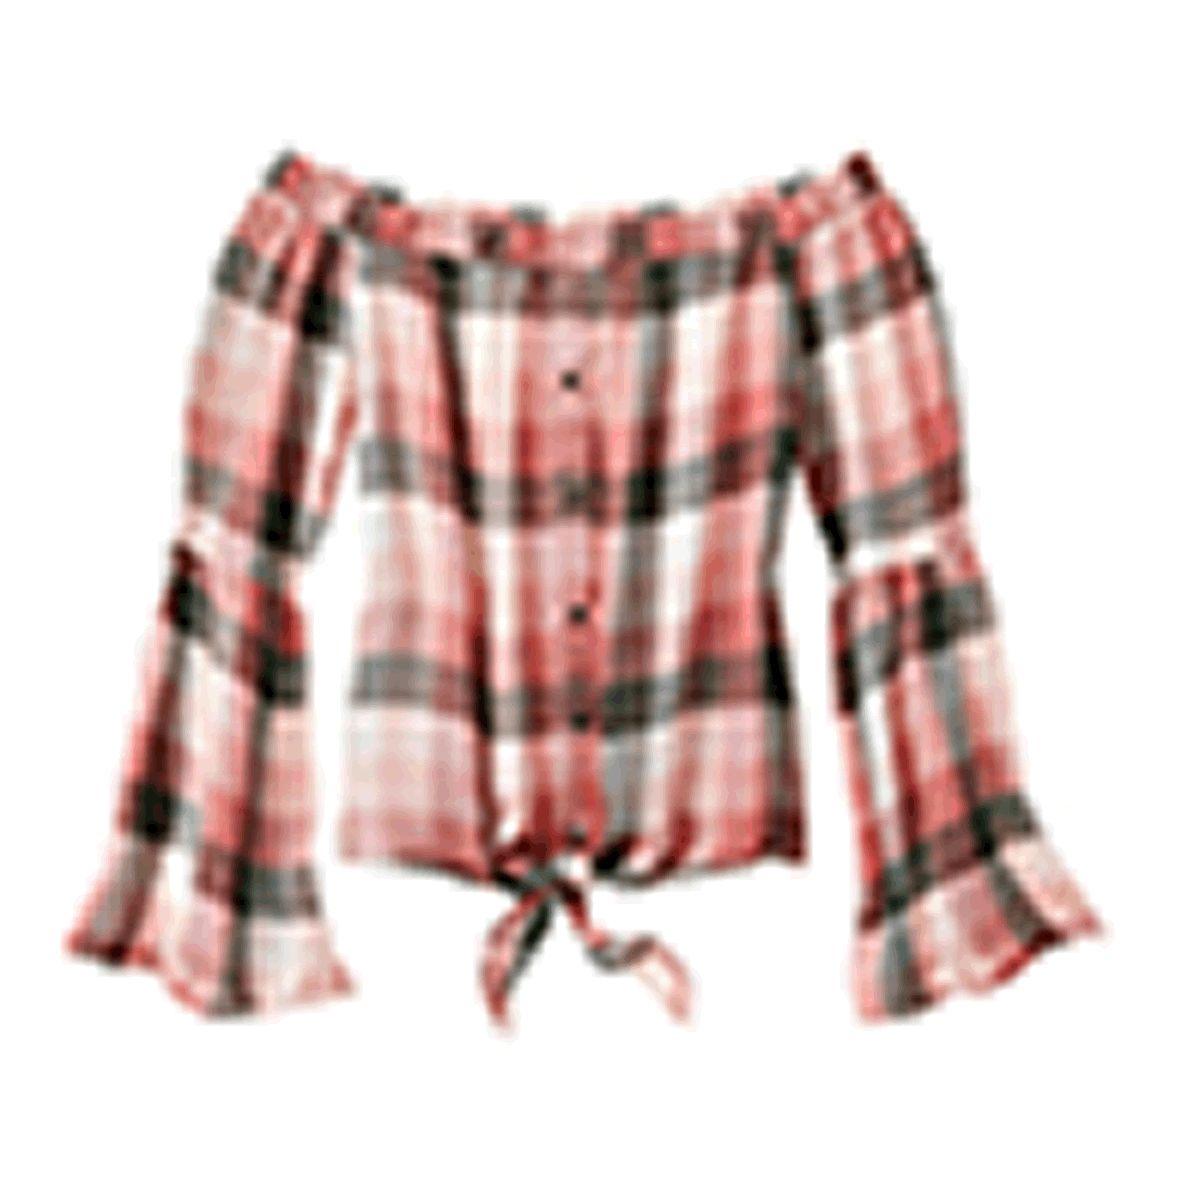 c0d14bcf52d1 American Rag Juniors Clothing - Dresses   Jeans - Macy s